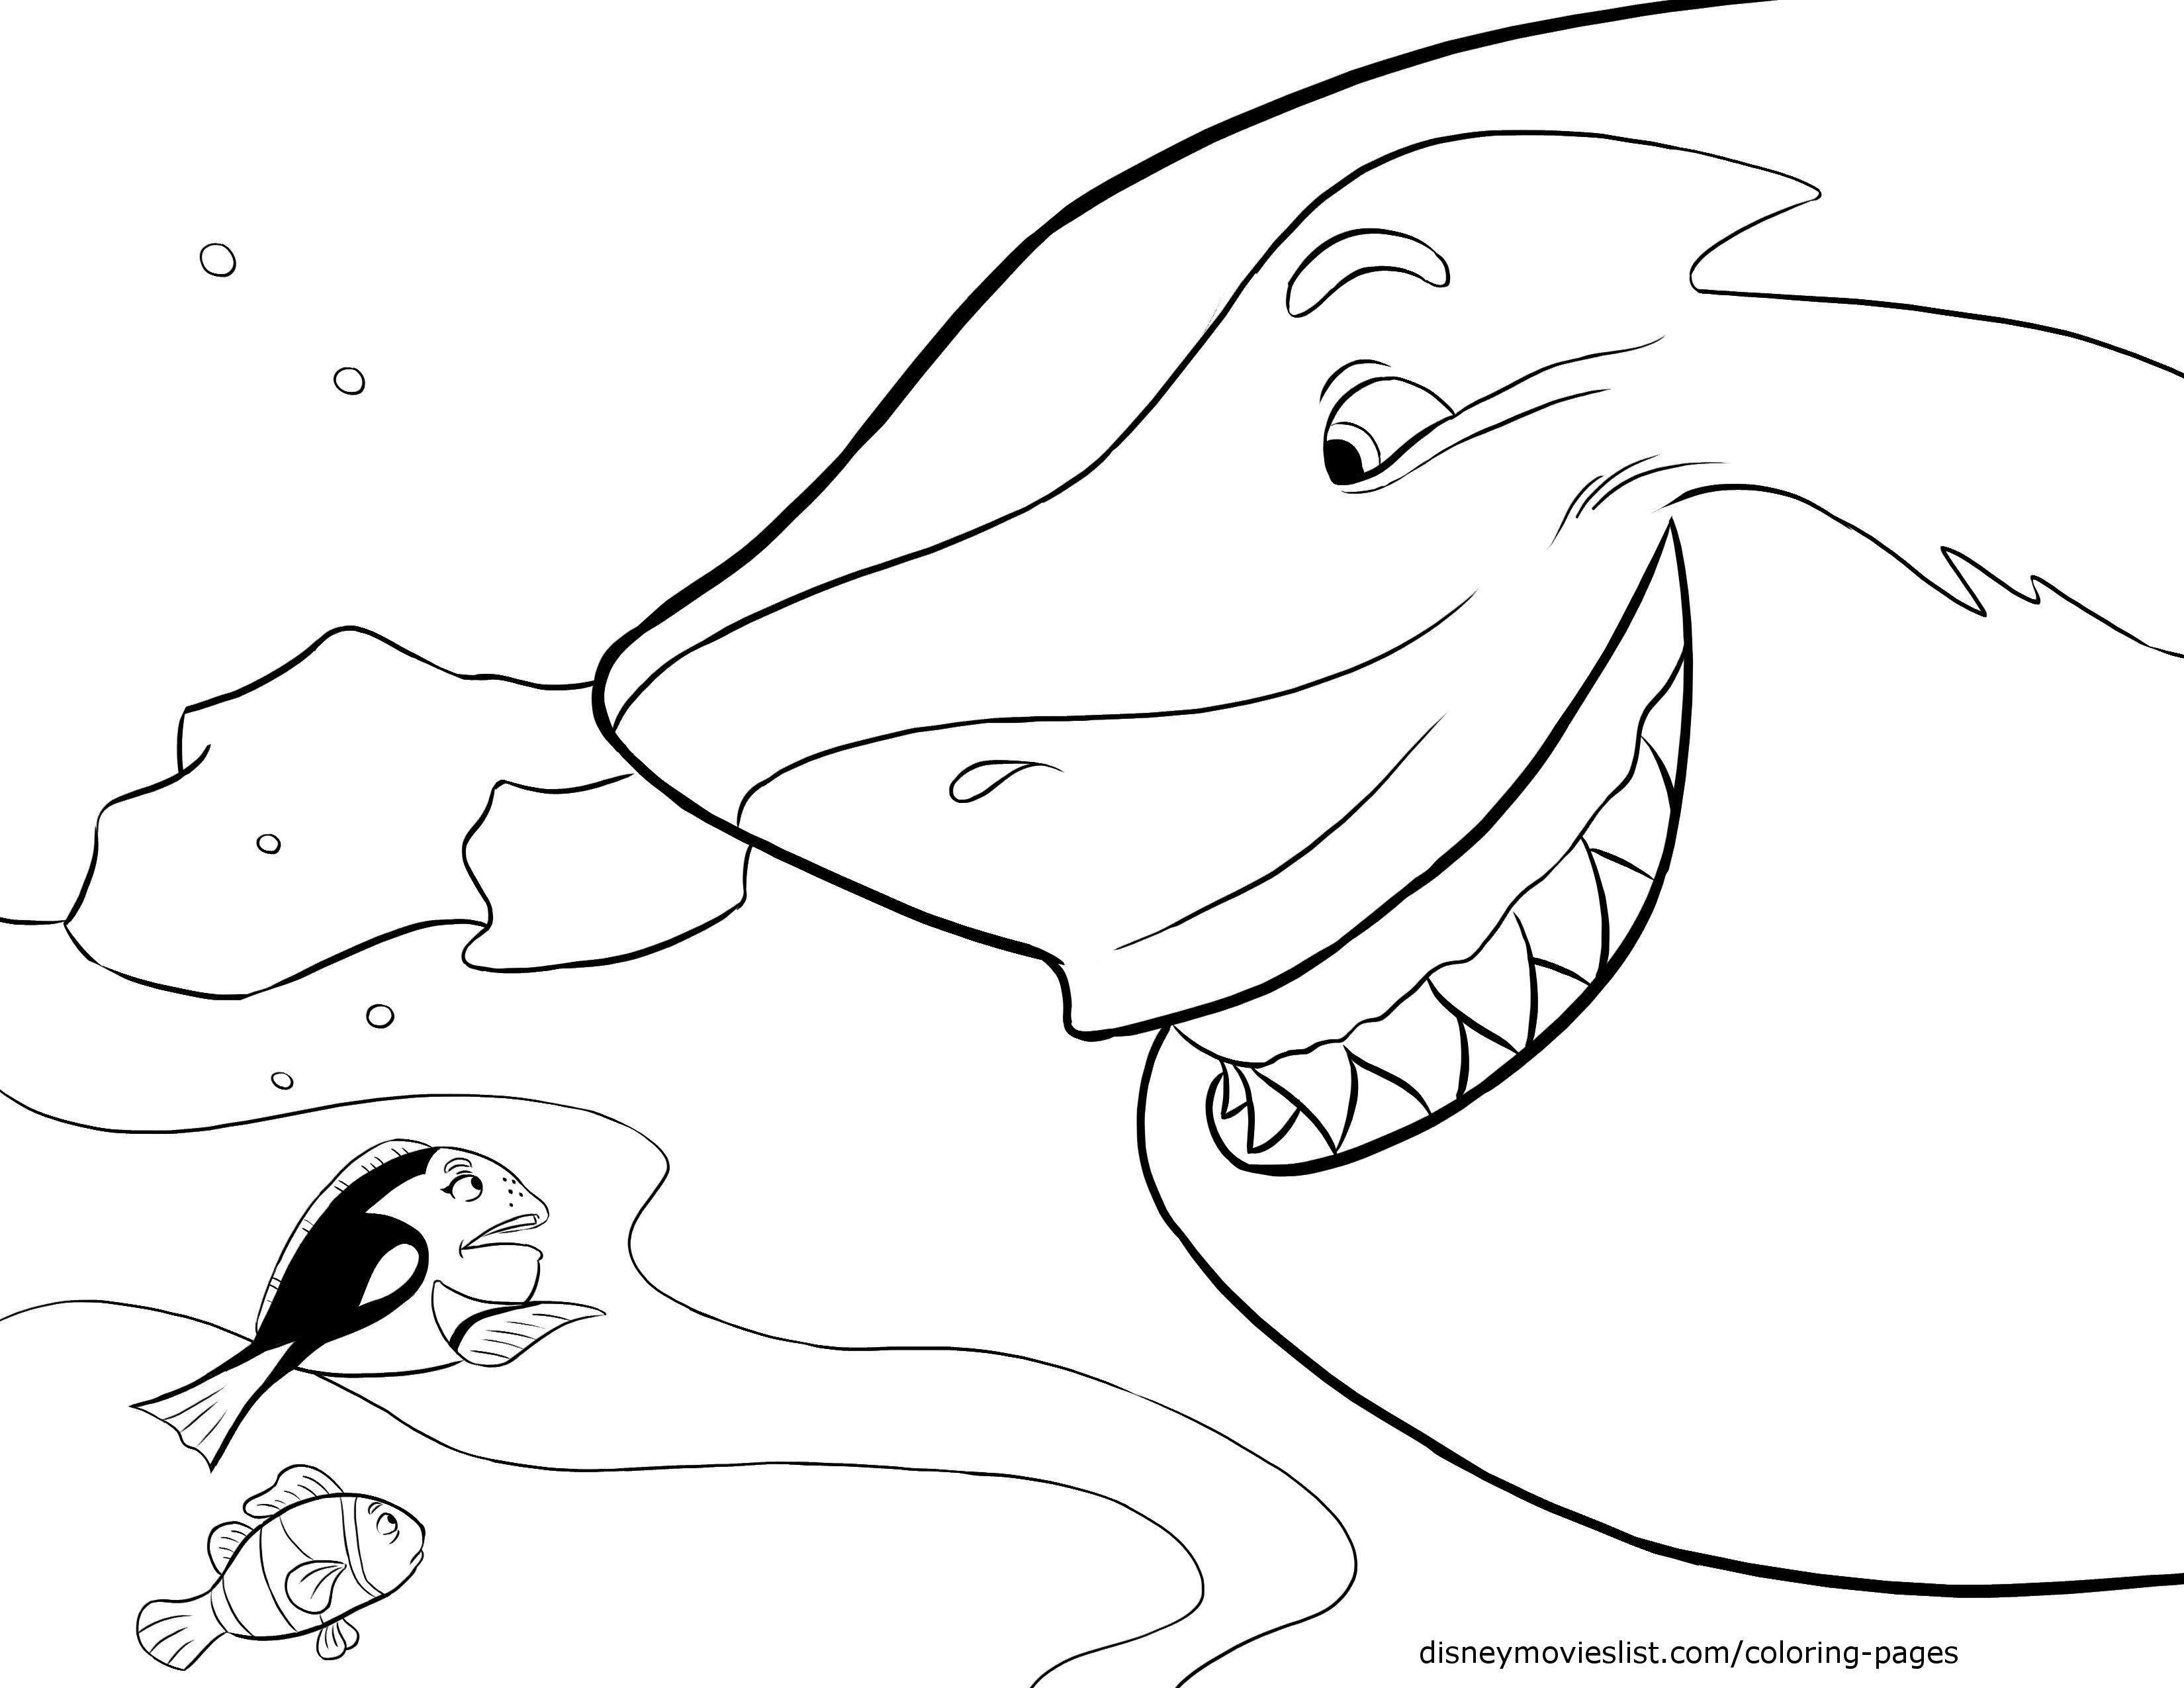 Disney 39 s Finding Nemo Coloring